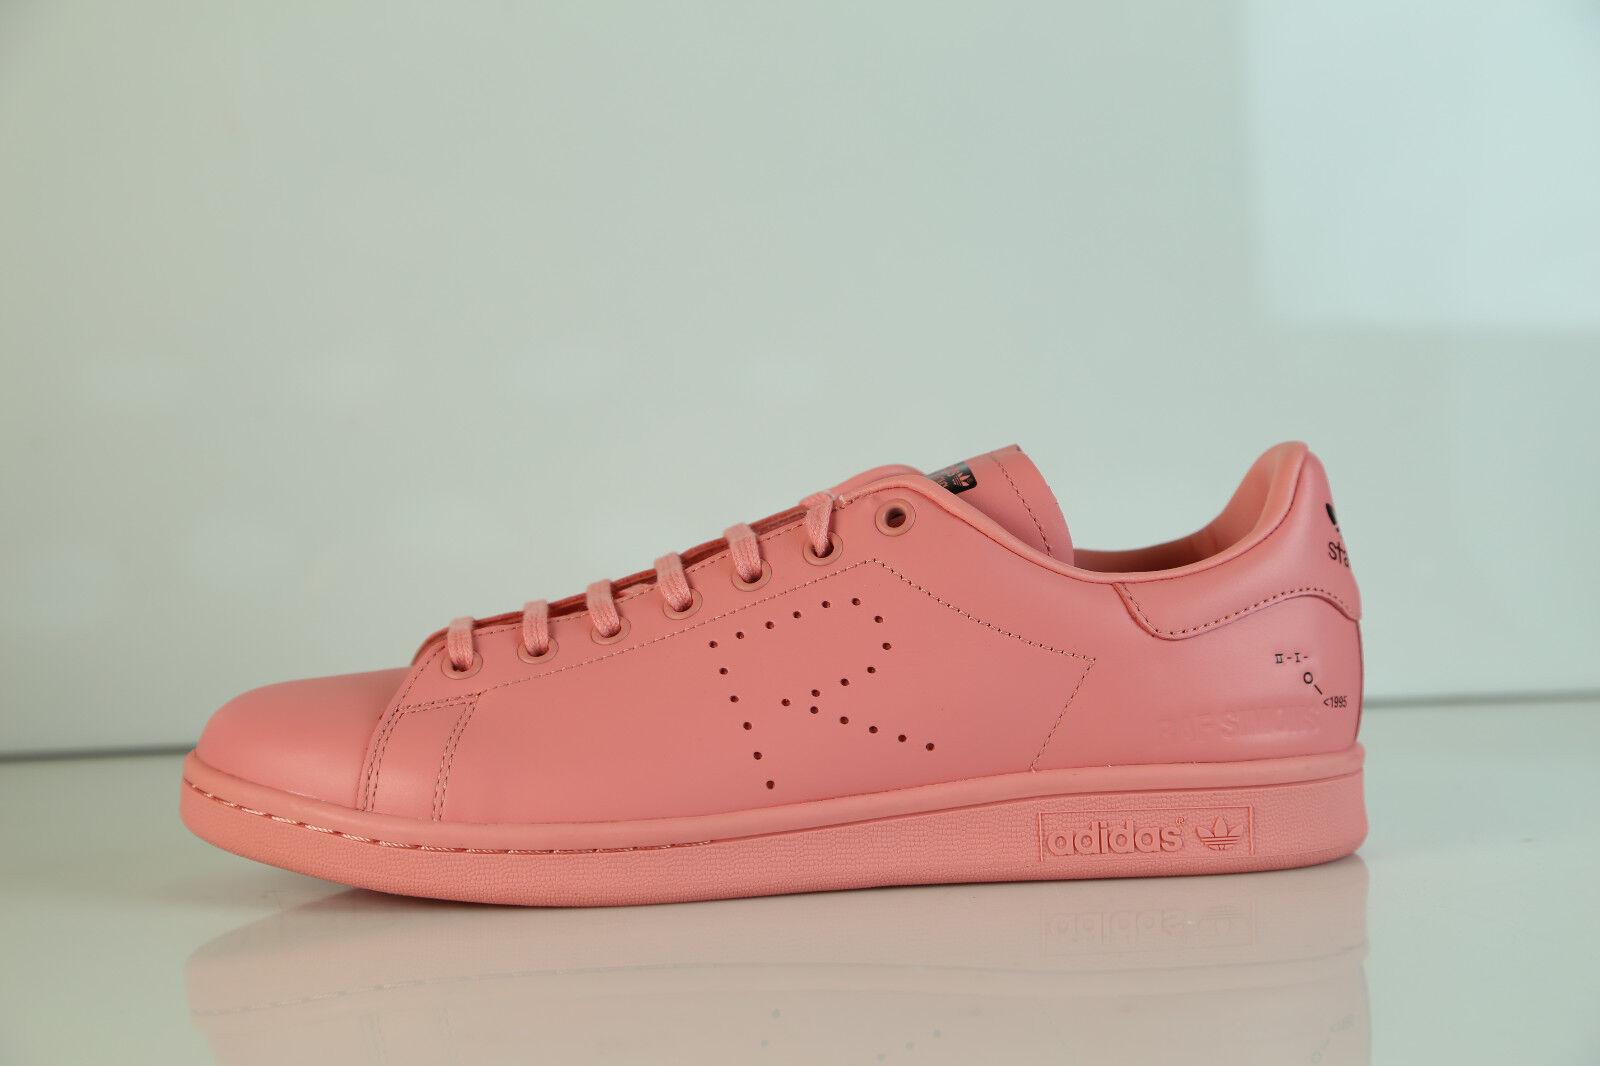 Adidas RS Raf Simons Stan Smith Bliss Pink F34269 8-12 ss